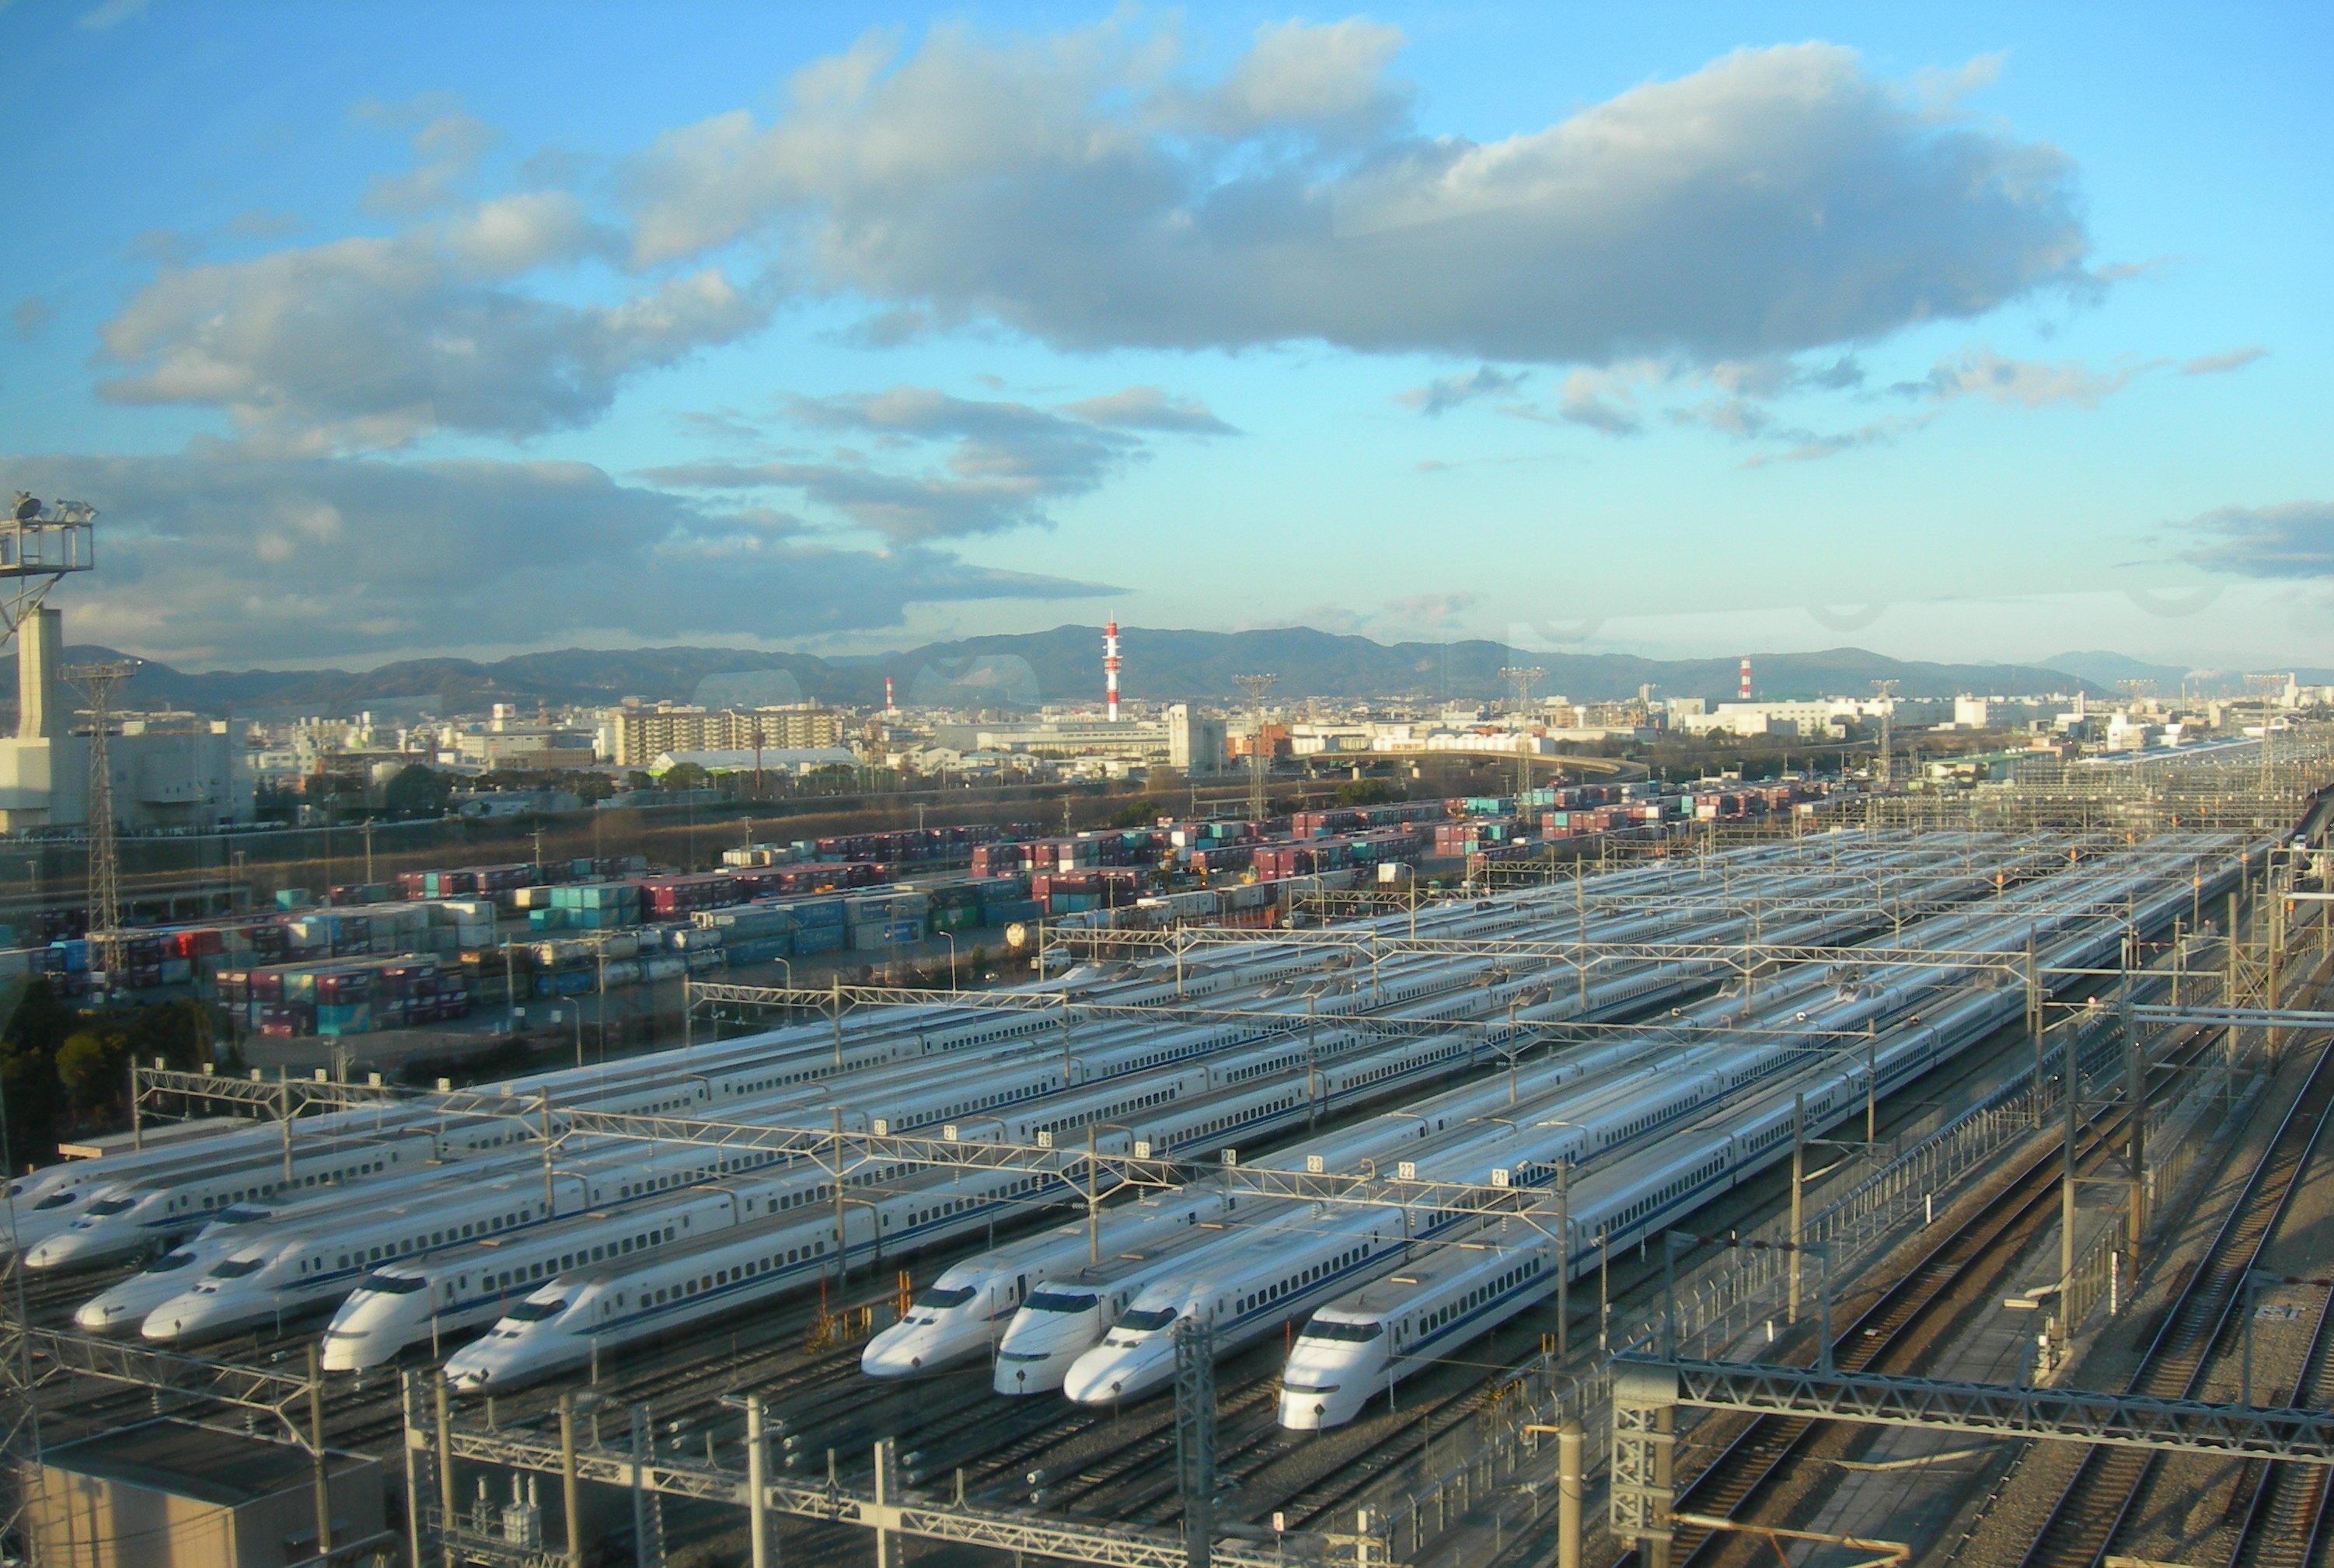 https://upload.wikimedia.org/wikipedia/commons/3/35/Torikai-train-base.JPG